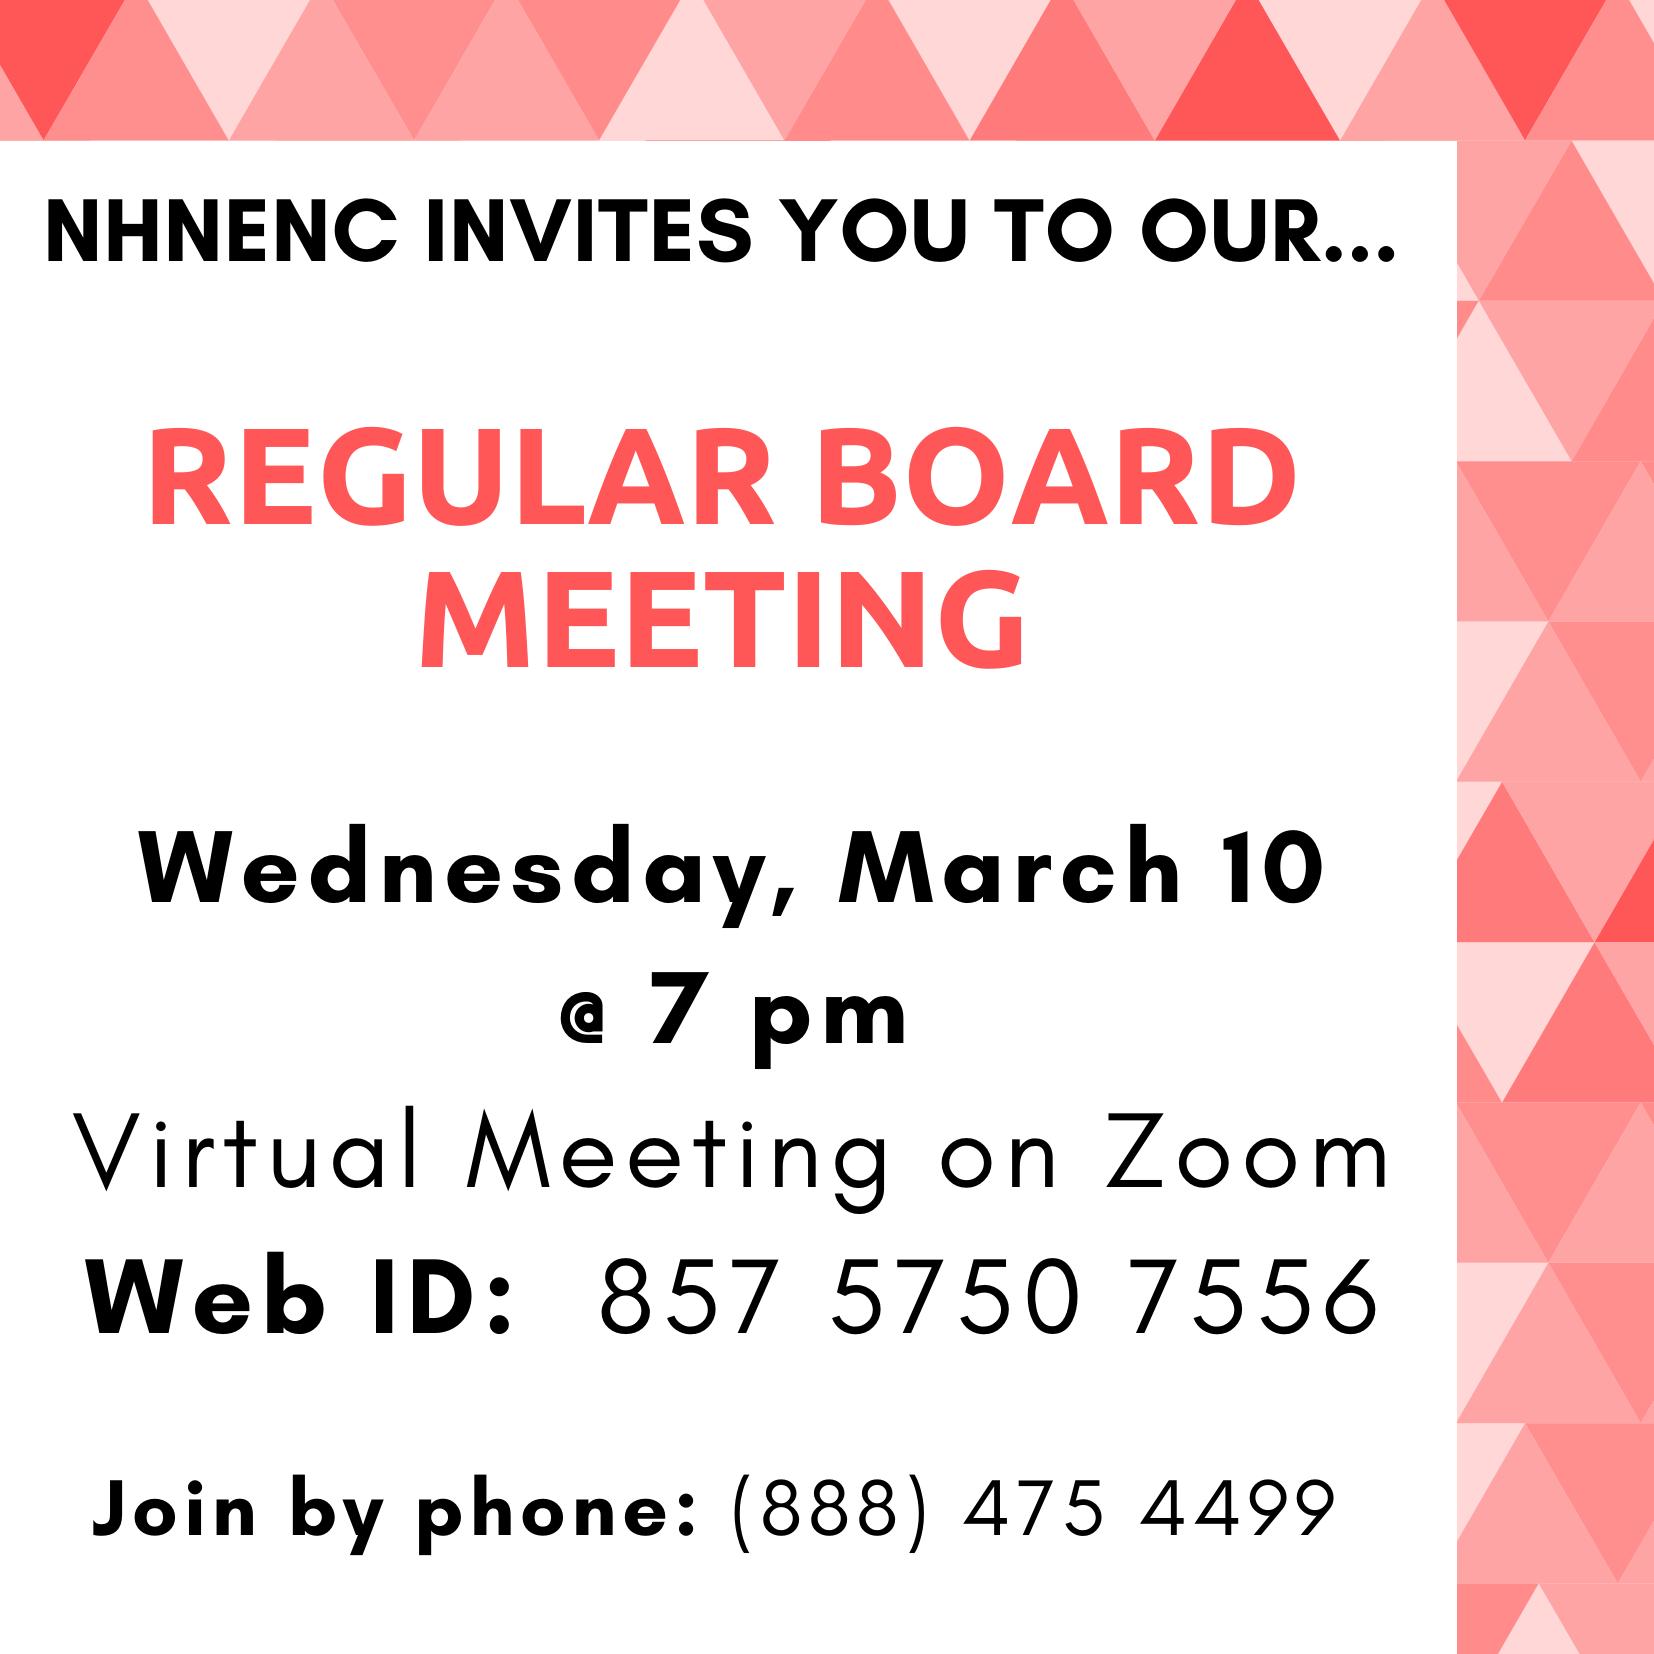 Meeting announcement